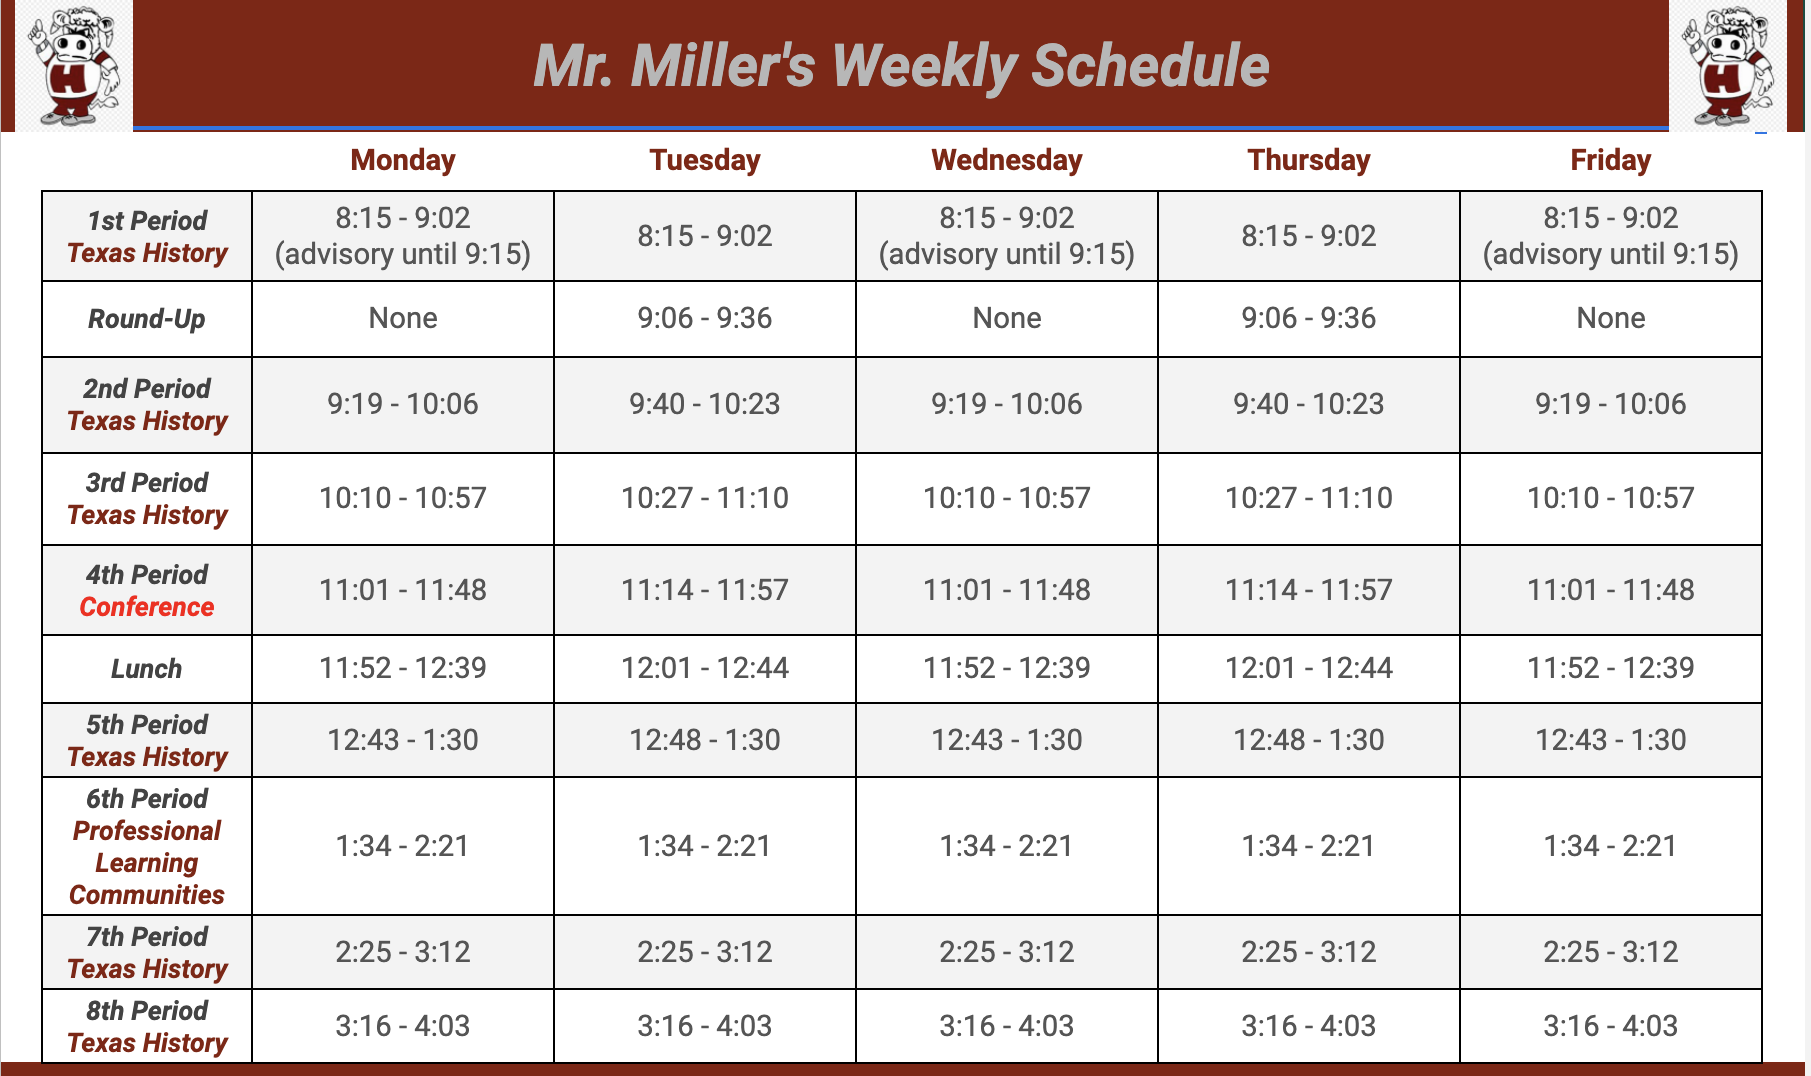 Mr. Miller's Schedule